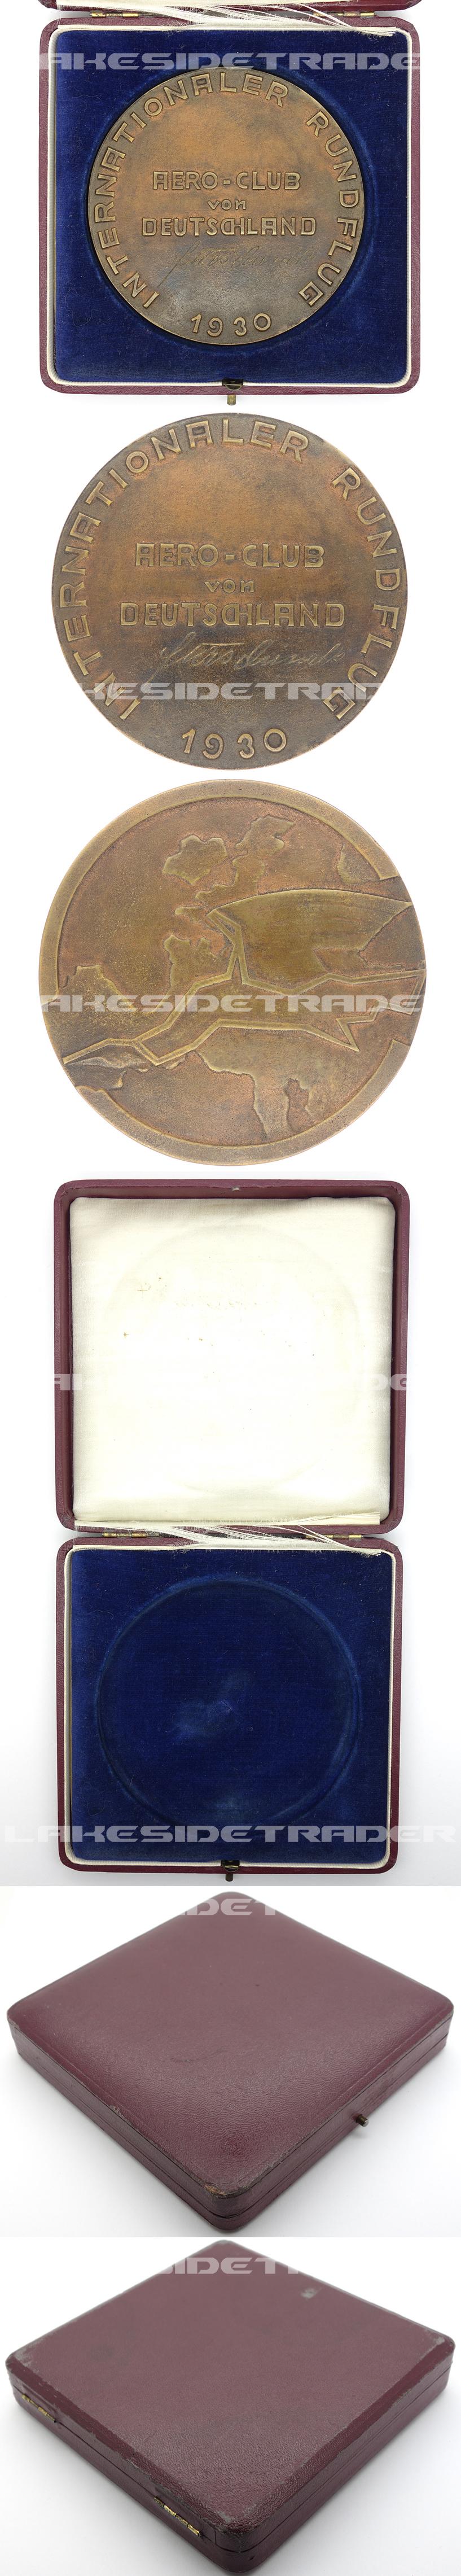 German Cased Aero-Club Medallion 1930